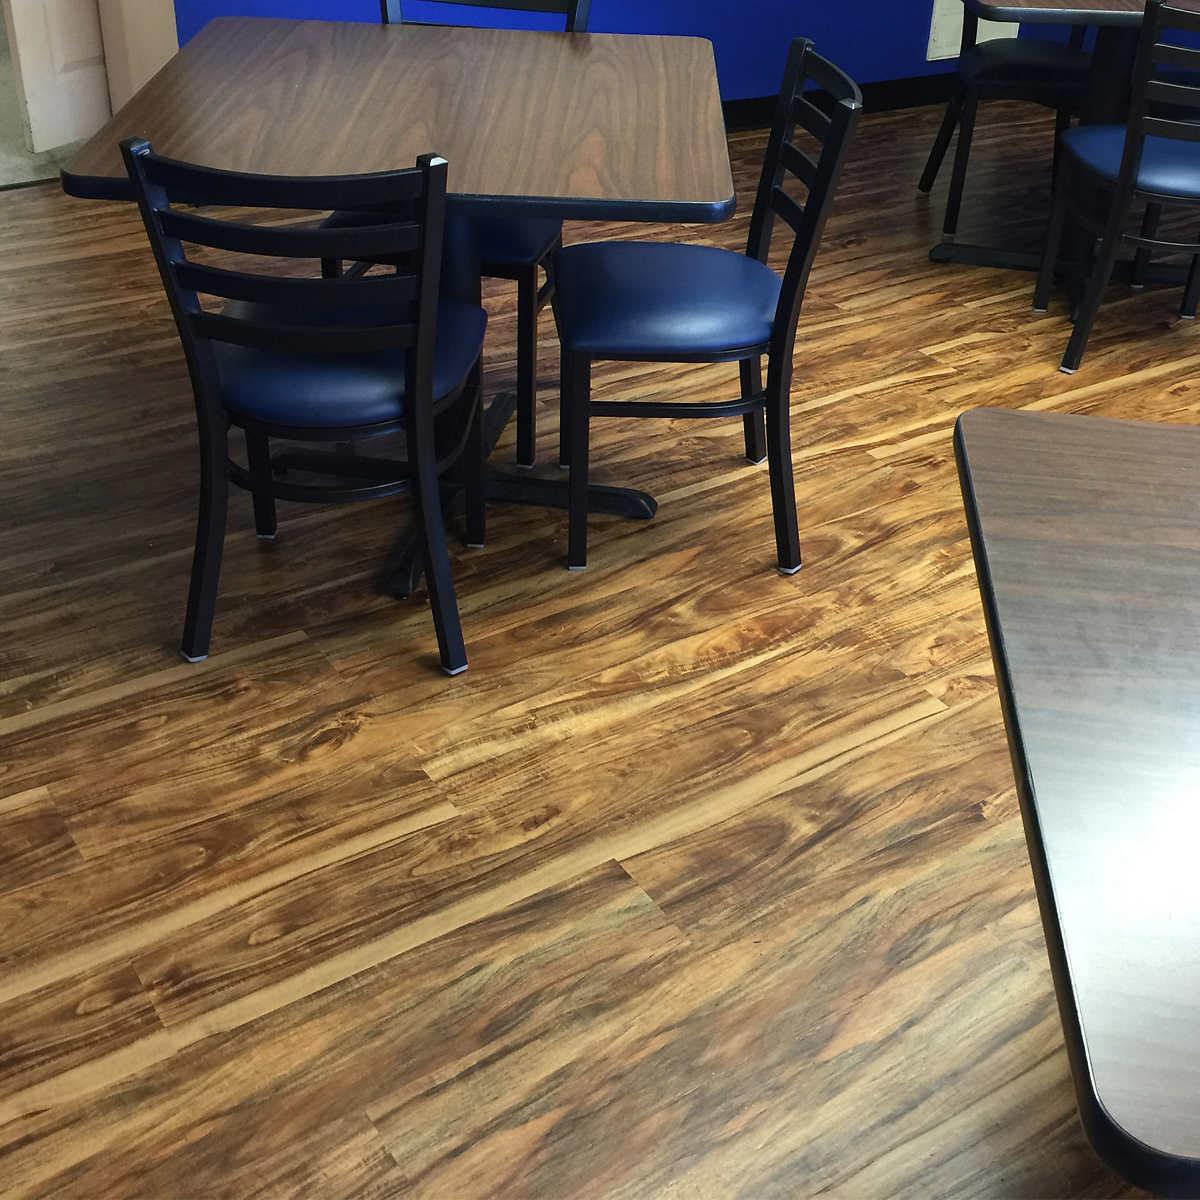 Vinyl Tile Flooring coastal gray resilient vinyl tile flooring 30 Sunburst Acacia Power Click Flooring Luxury Vinyl Tile System